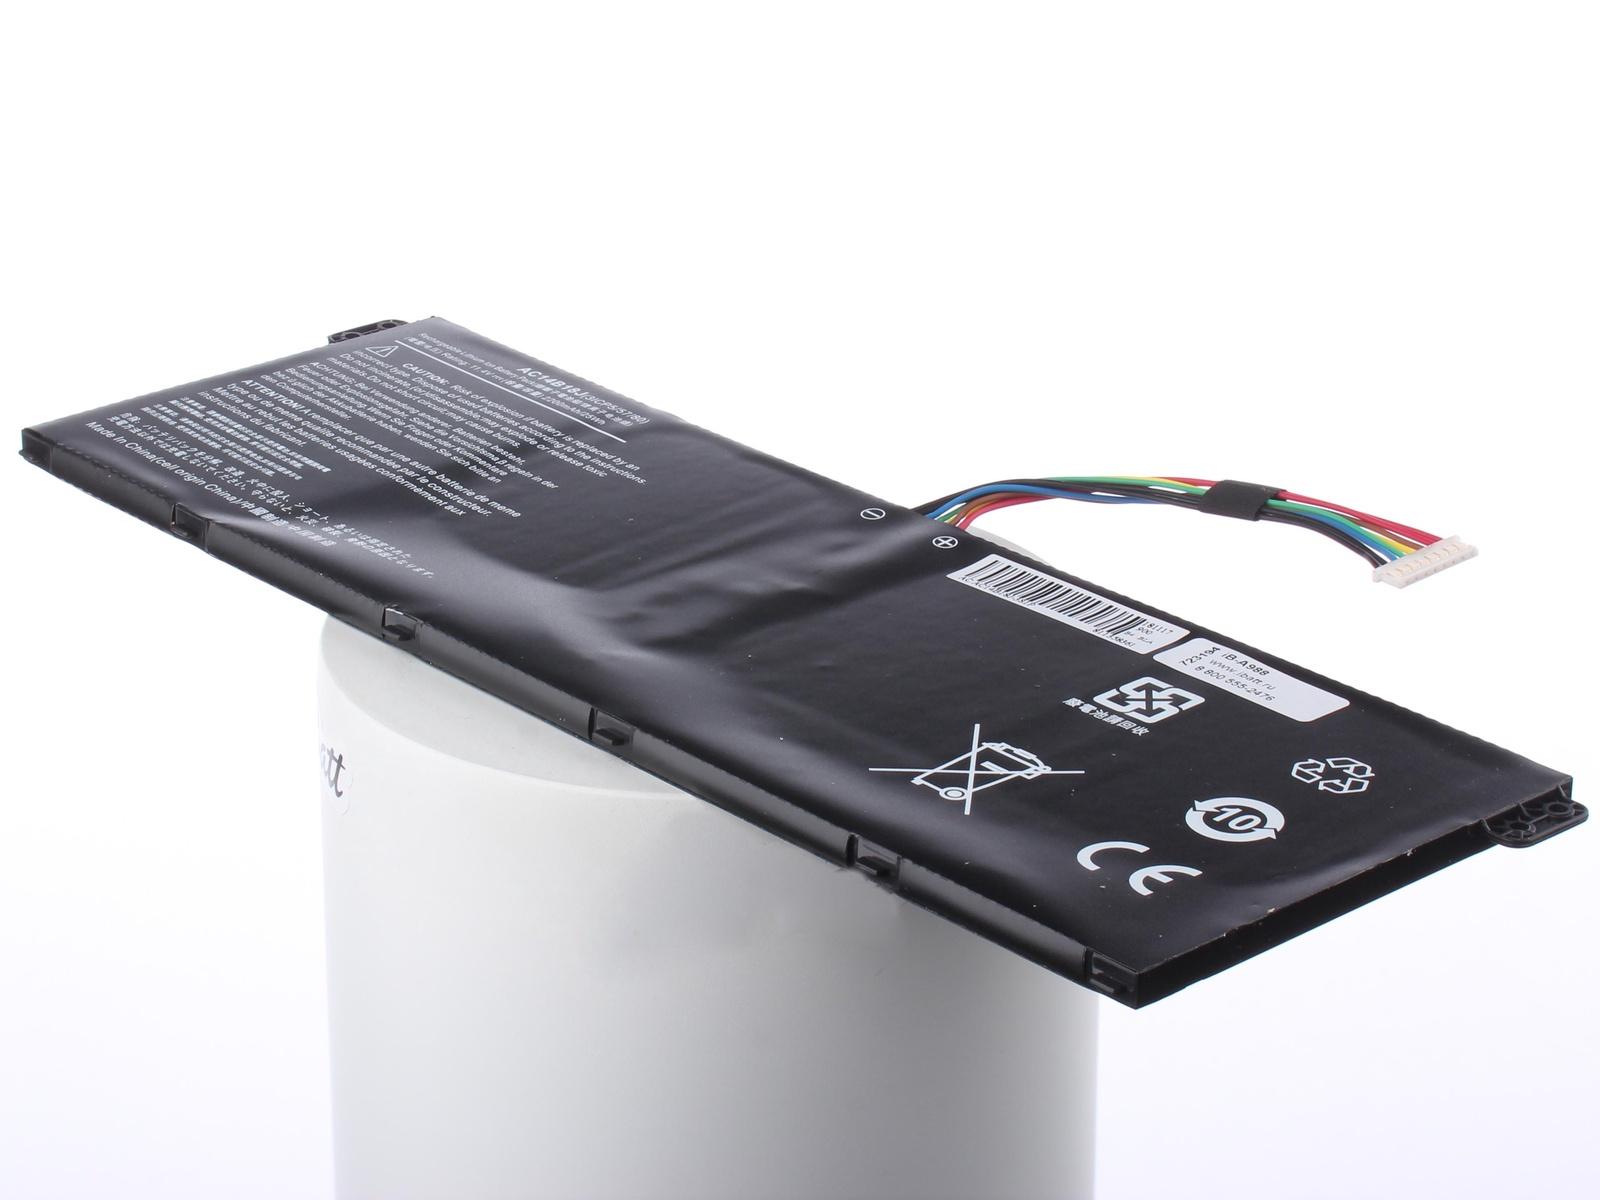 цены на Аккумуляторная батарея iBatt iB-T4-A988 3220mAh для ноутбуков Acer Aspire ES1-731G-P25D, ASPIRE ES1-331-C1KO, Aspire ES1-331-P2KU, Aspire ES1-331-C4NZ, ASPIRE ES1-531-C432, ASPIRE ES1-531-P5DN, Aspire ES1-731G-C4E3, Aspire ES1-731-P921,  в интернет-магазинах